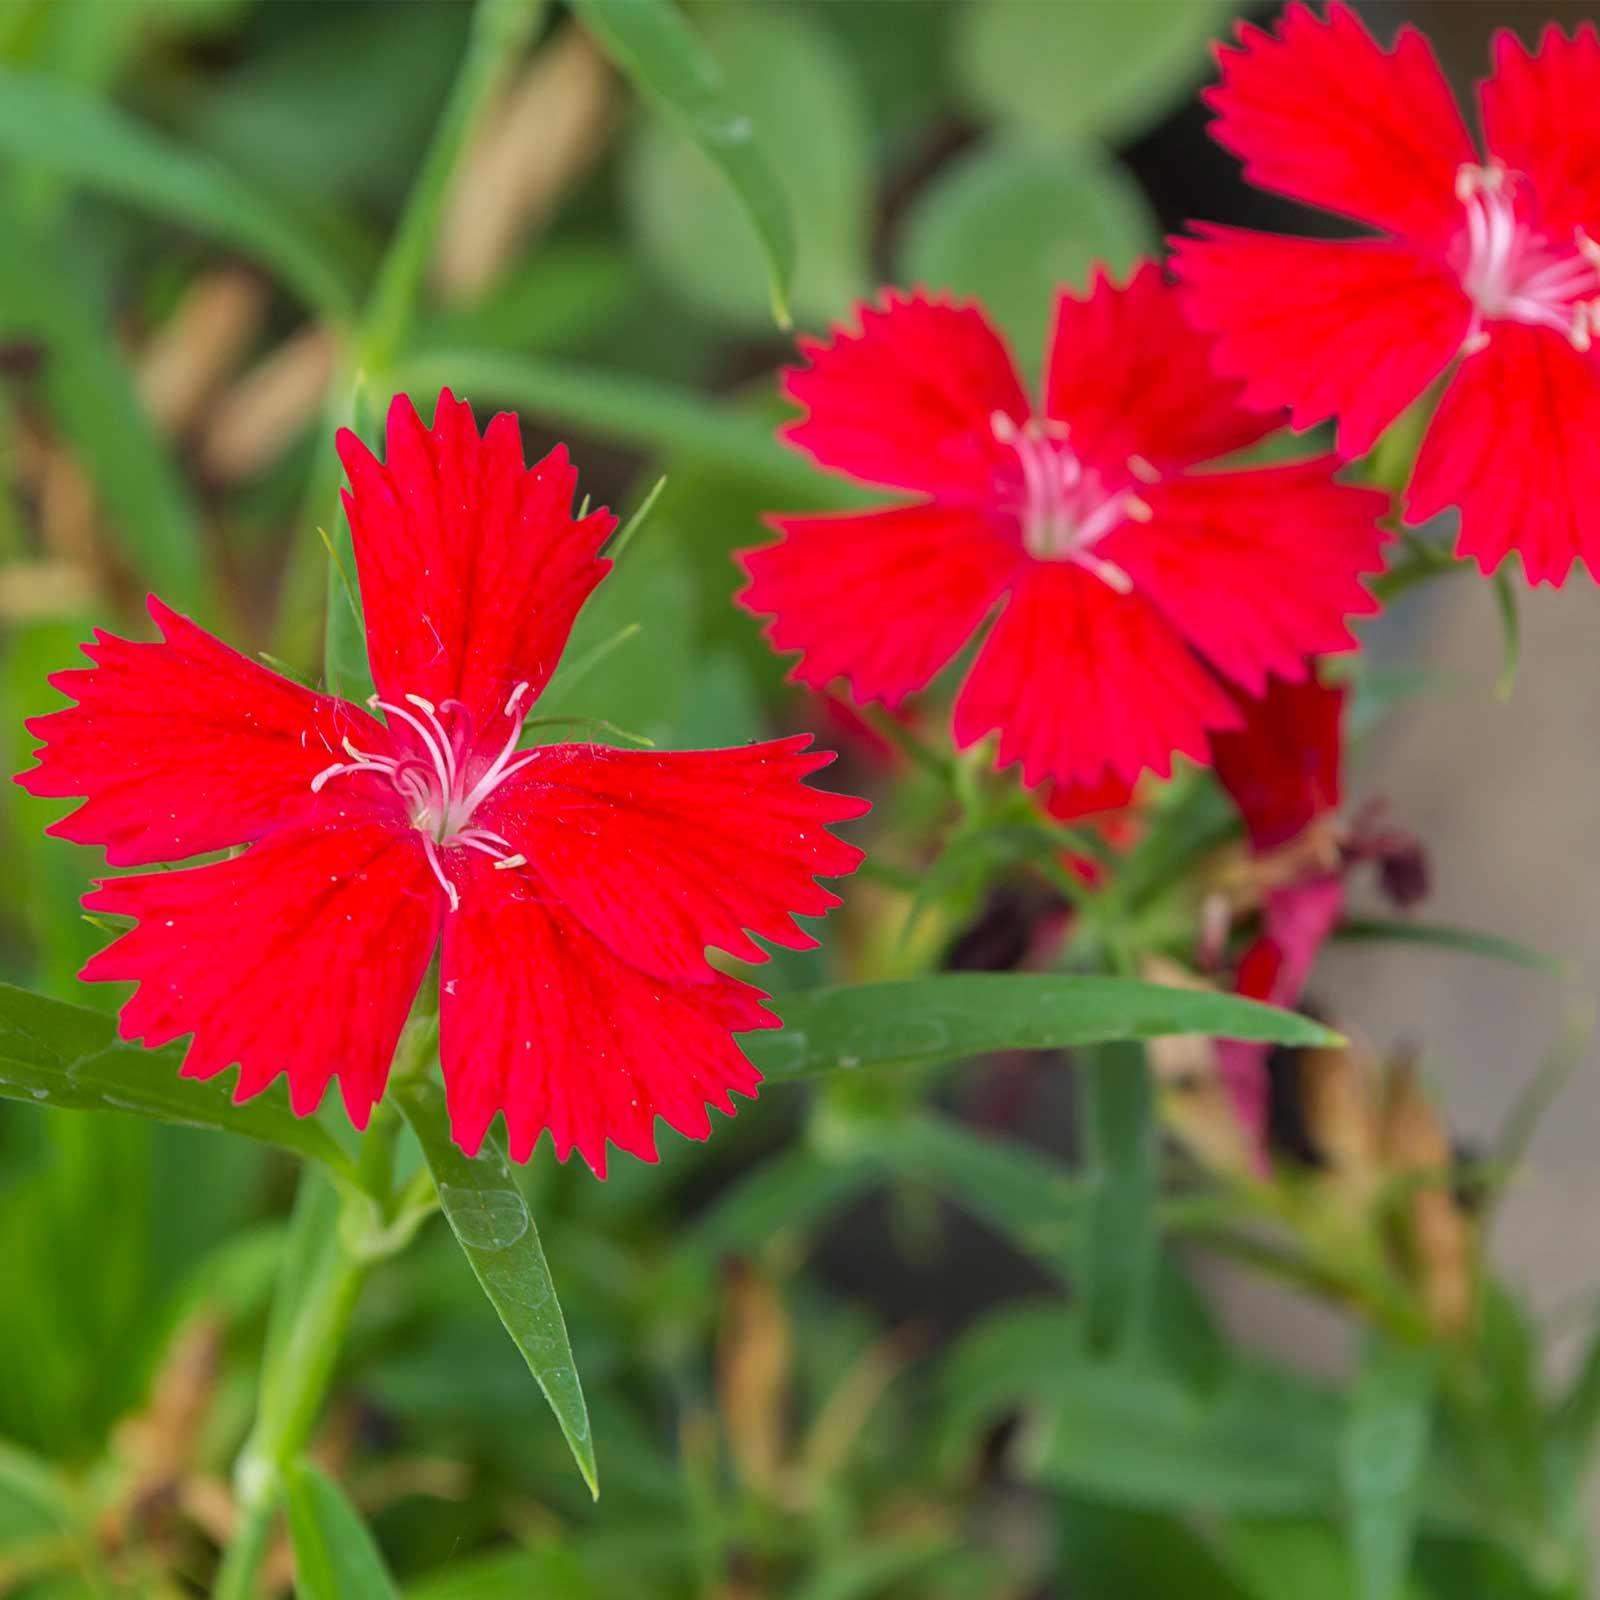 Dianthus Zing Rose Flower Seeds - Deep Red - 1000 Seeds - Perennial Flower Garden Seeds - Dianthus deltoidess